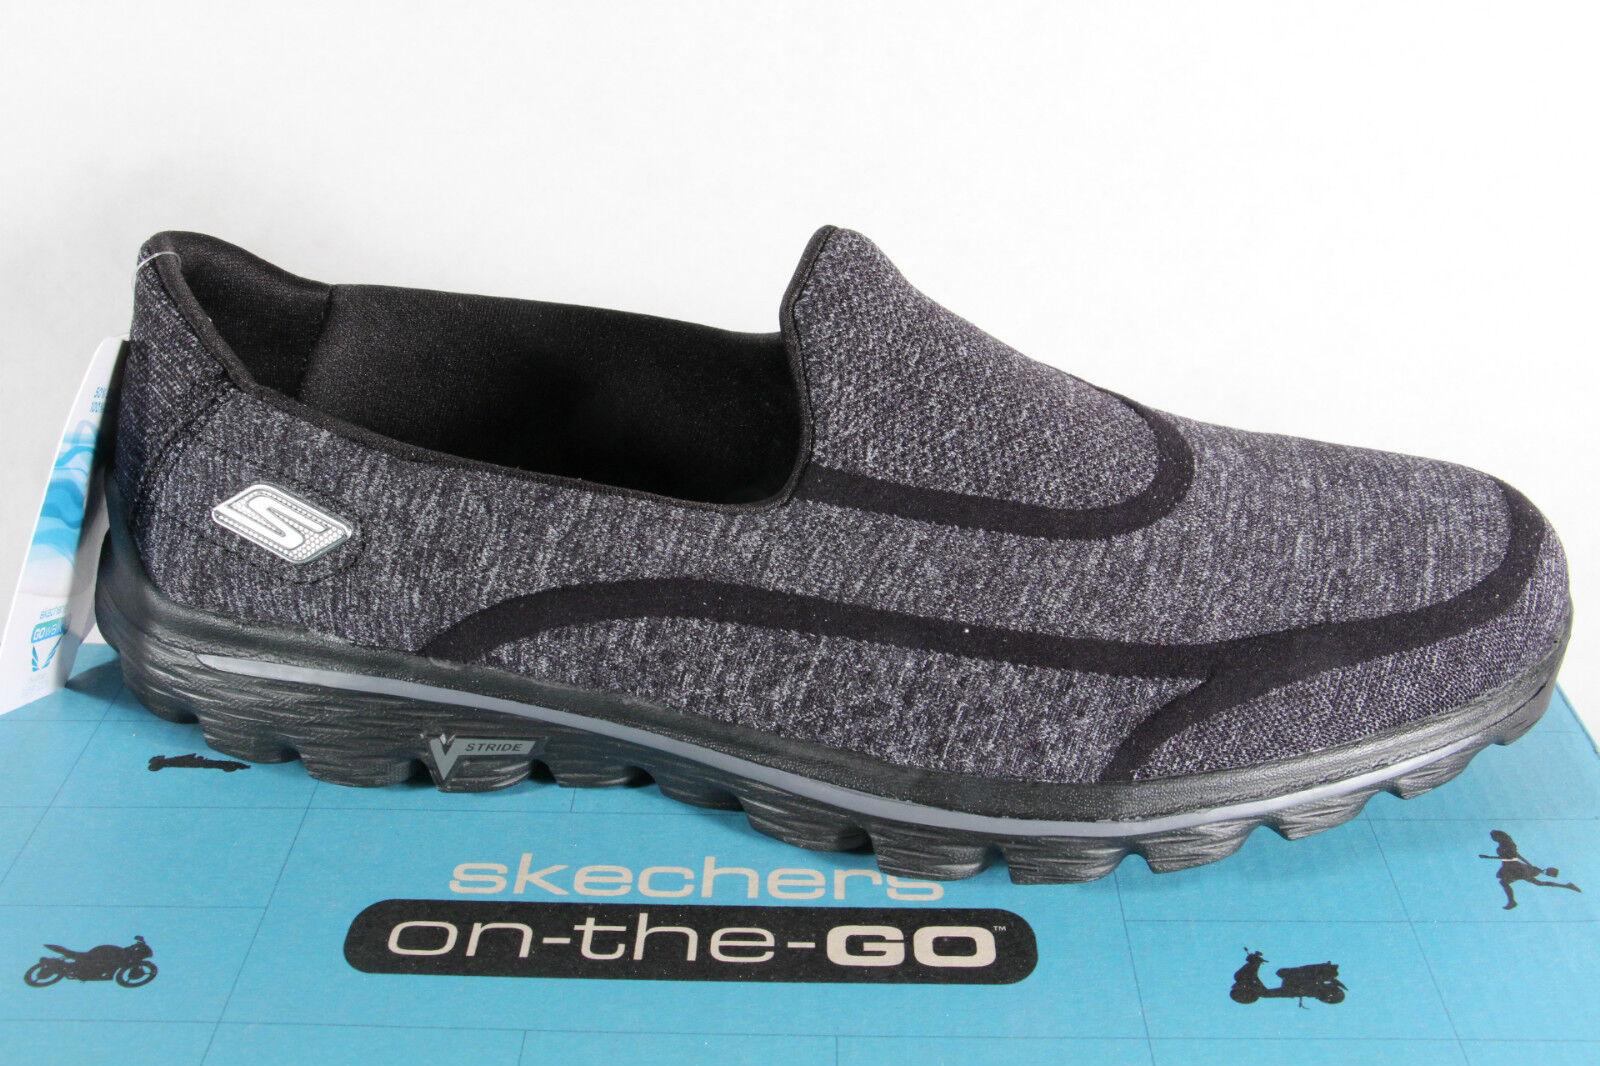 Skechers GOWalk2, Slipper, Sneakers Sportschuhe NEU weiche Innensohle NEU Sportschuhe c35131